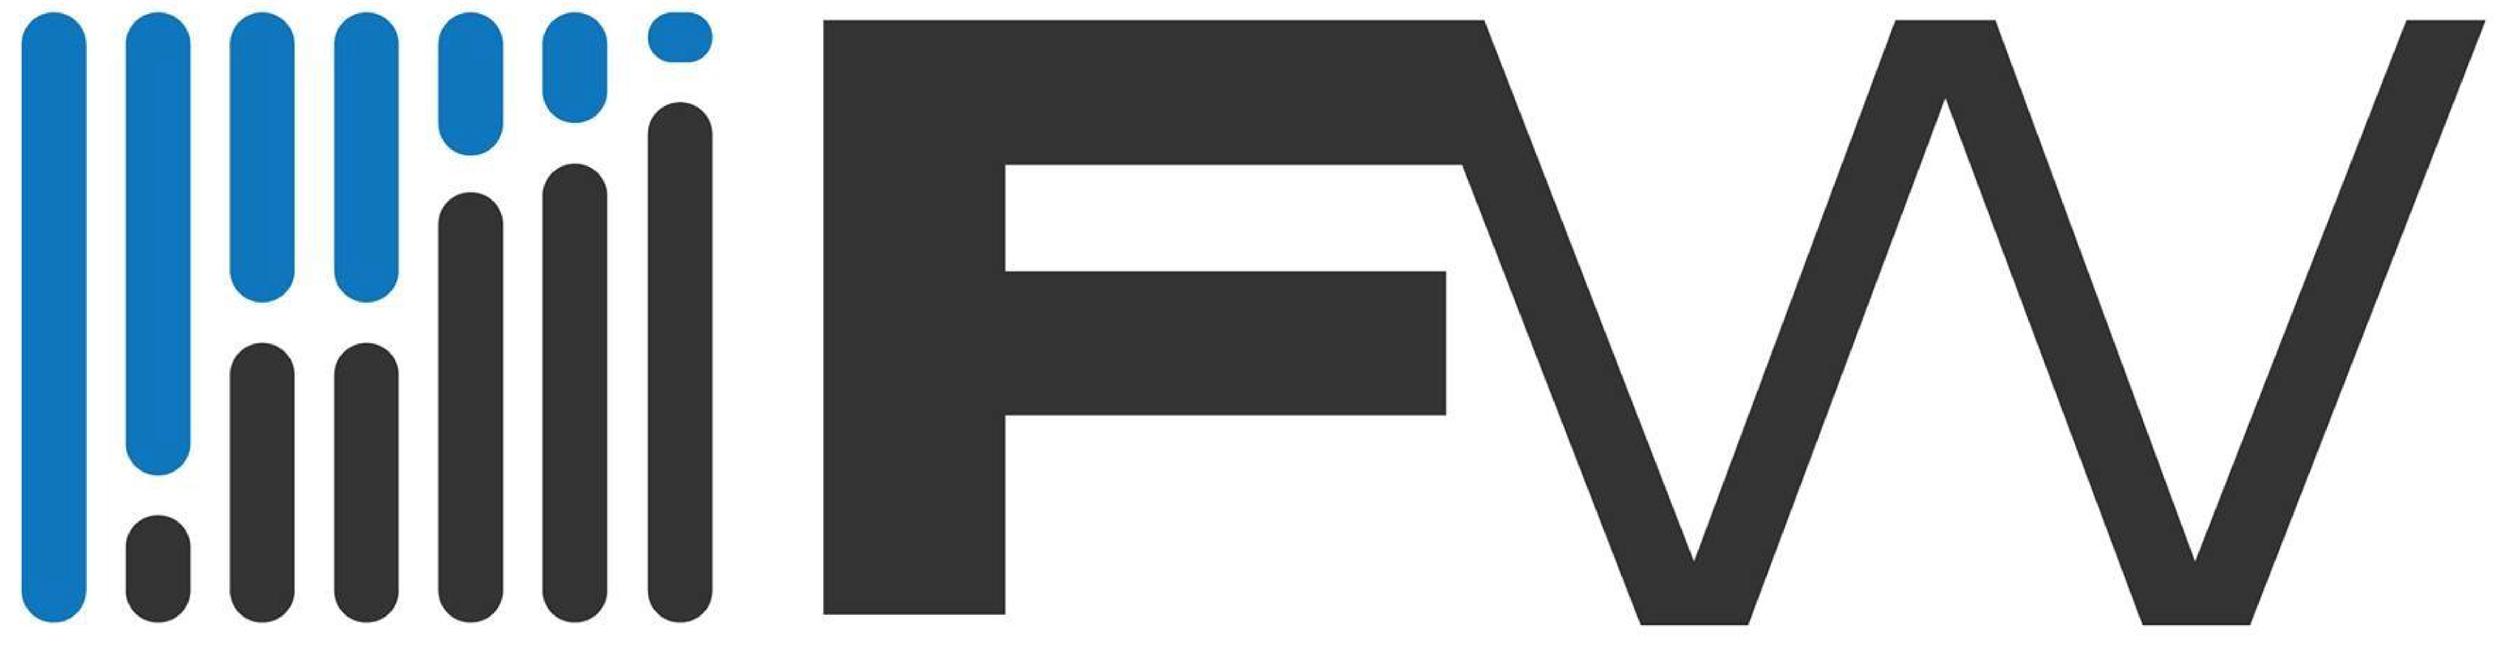 Freightwaves_logo-02.png